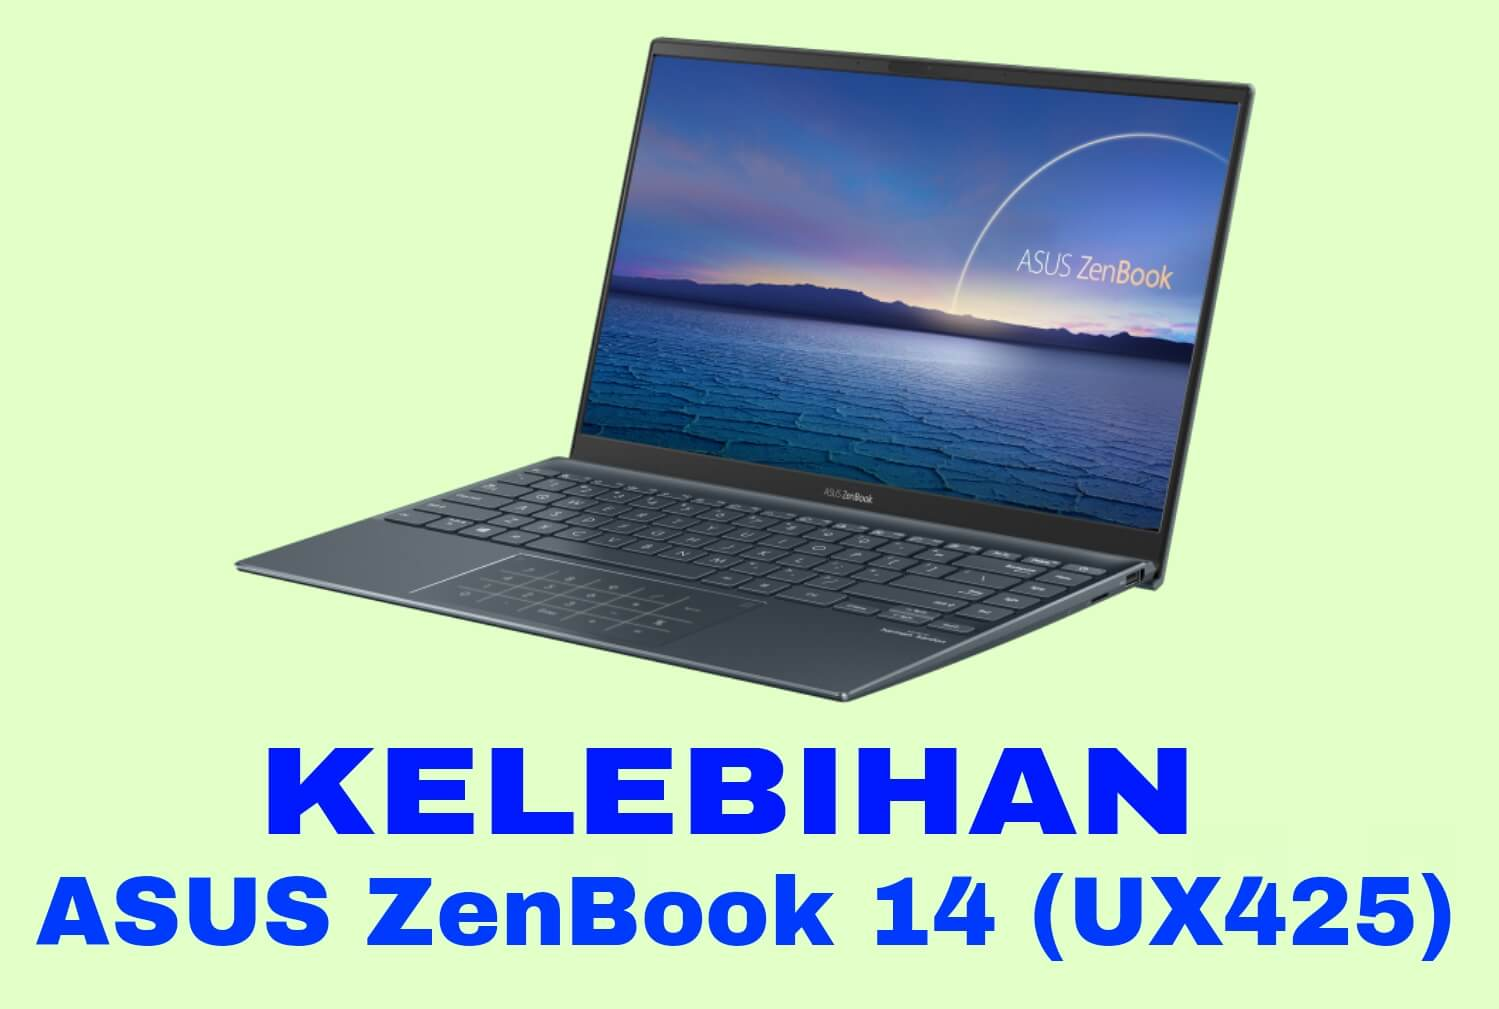 Kelebihan ASUS ZenBook 14 UX425